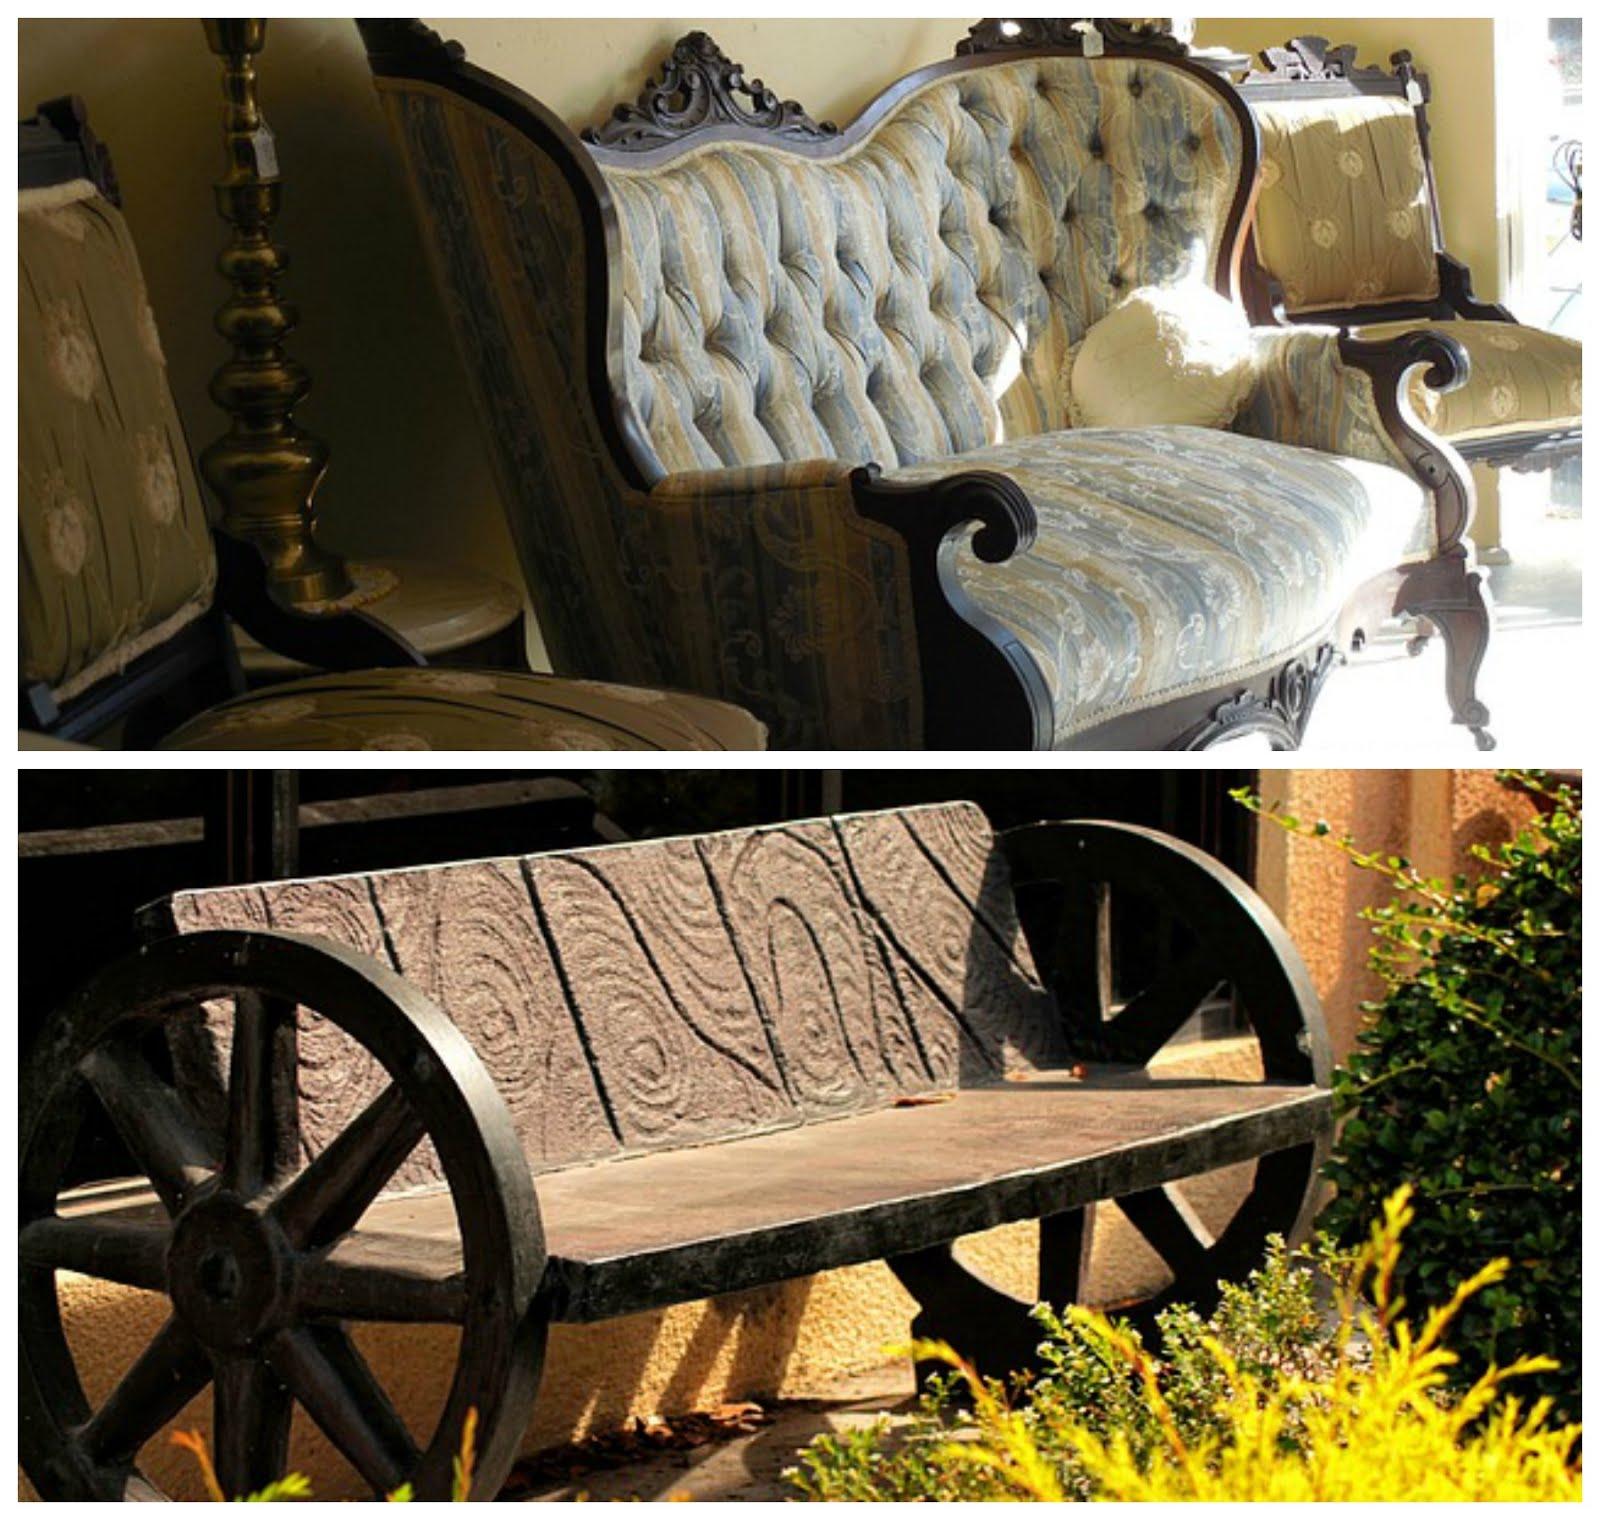 Design decor & disha: transform furniture into a statement piece ...